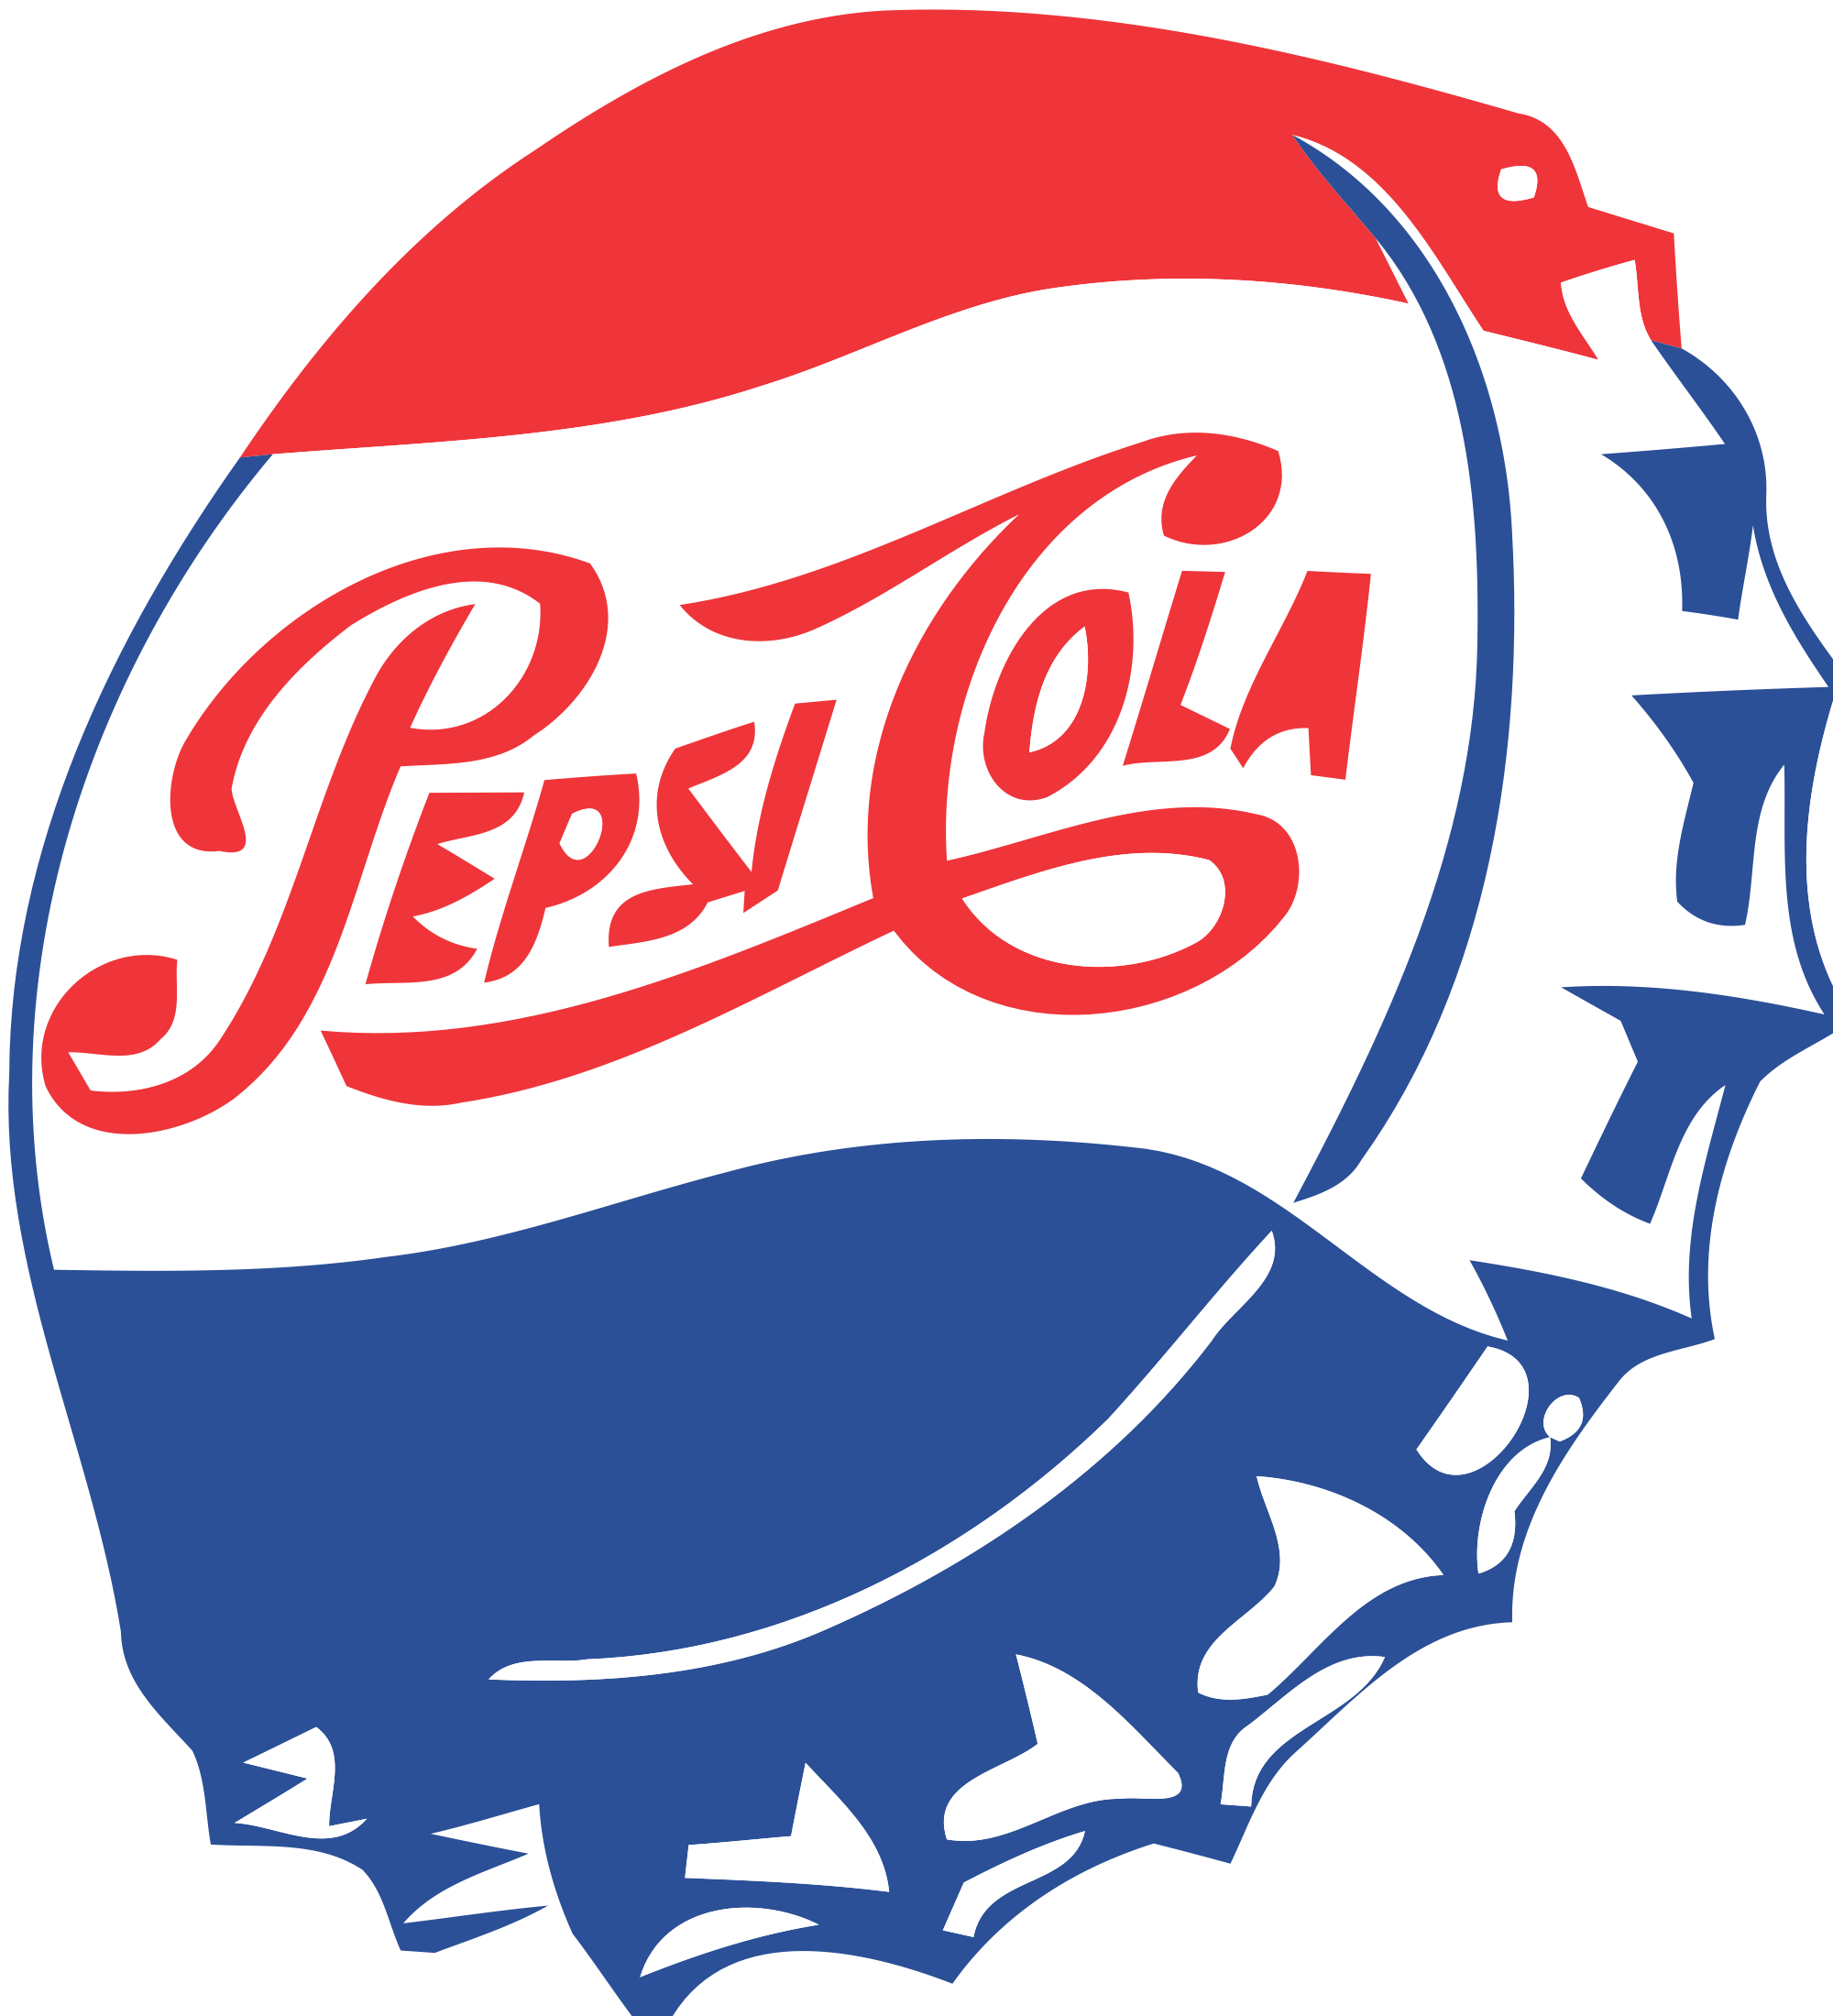 Pepsi logo hd wallpapers Pepsi logo, History logo, Pepsi